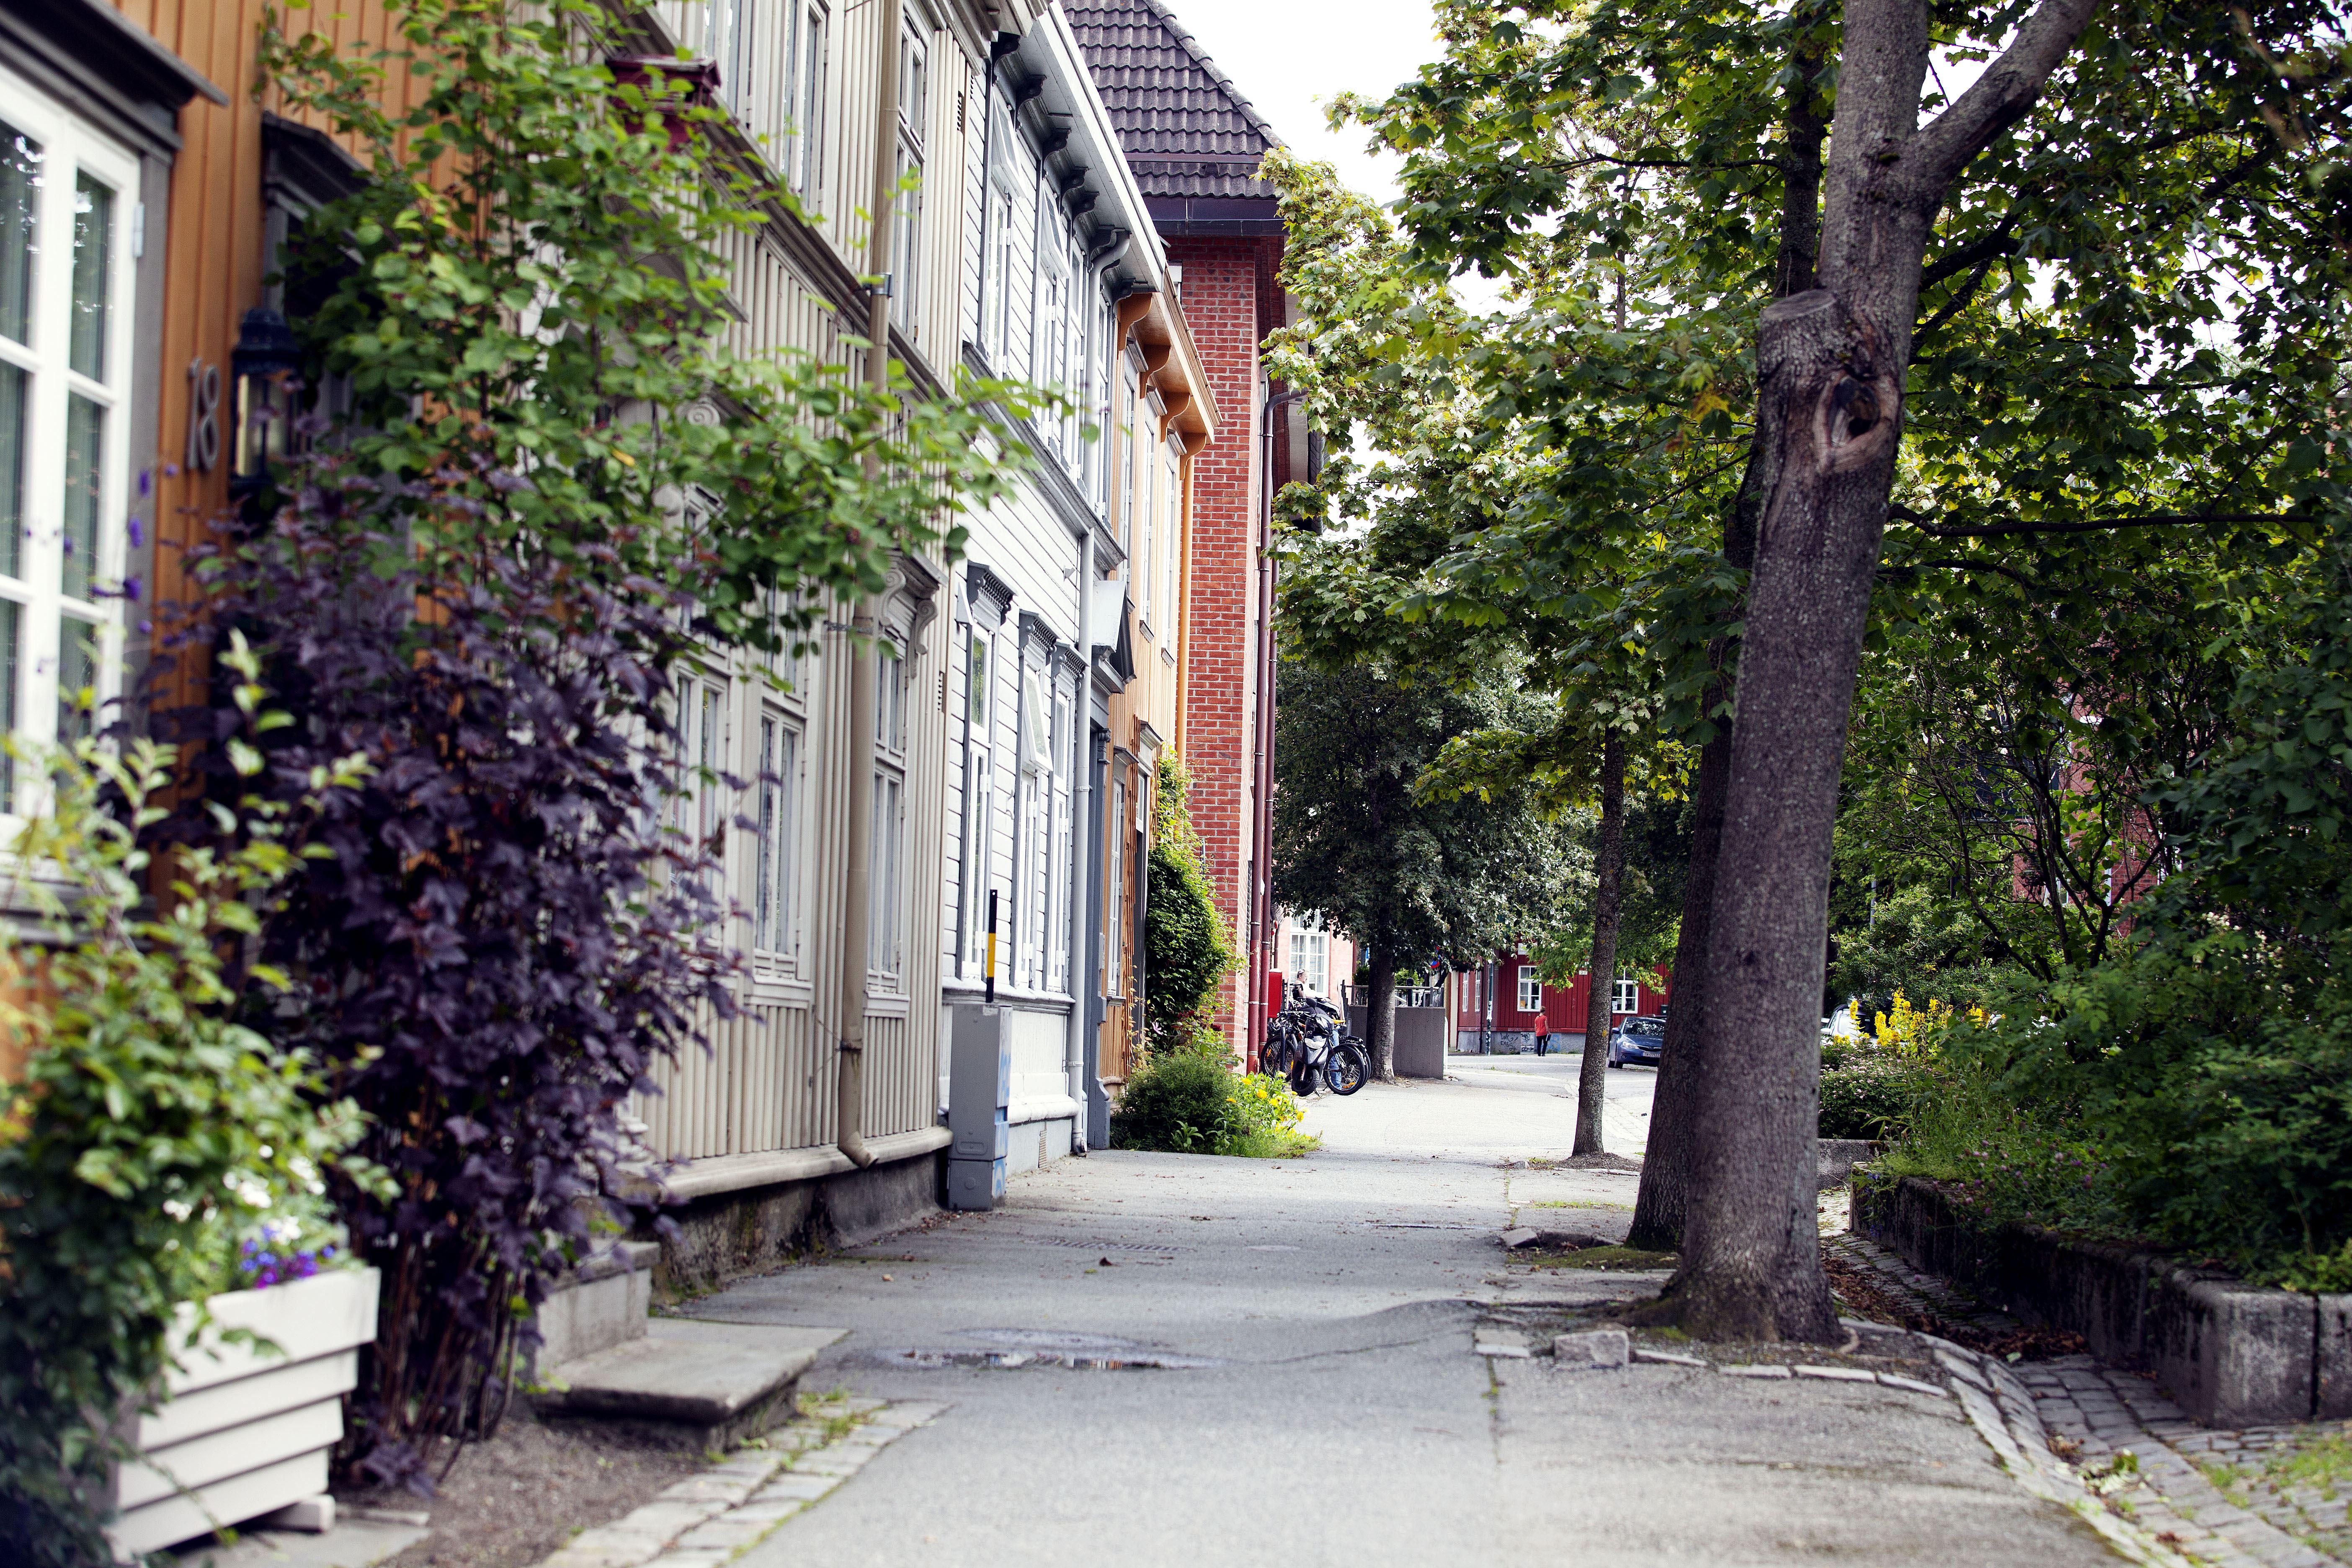 Tom Gustavsen/Visit Trondheim, Hospitalsløkkan area